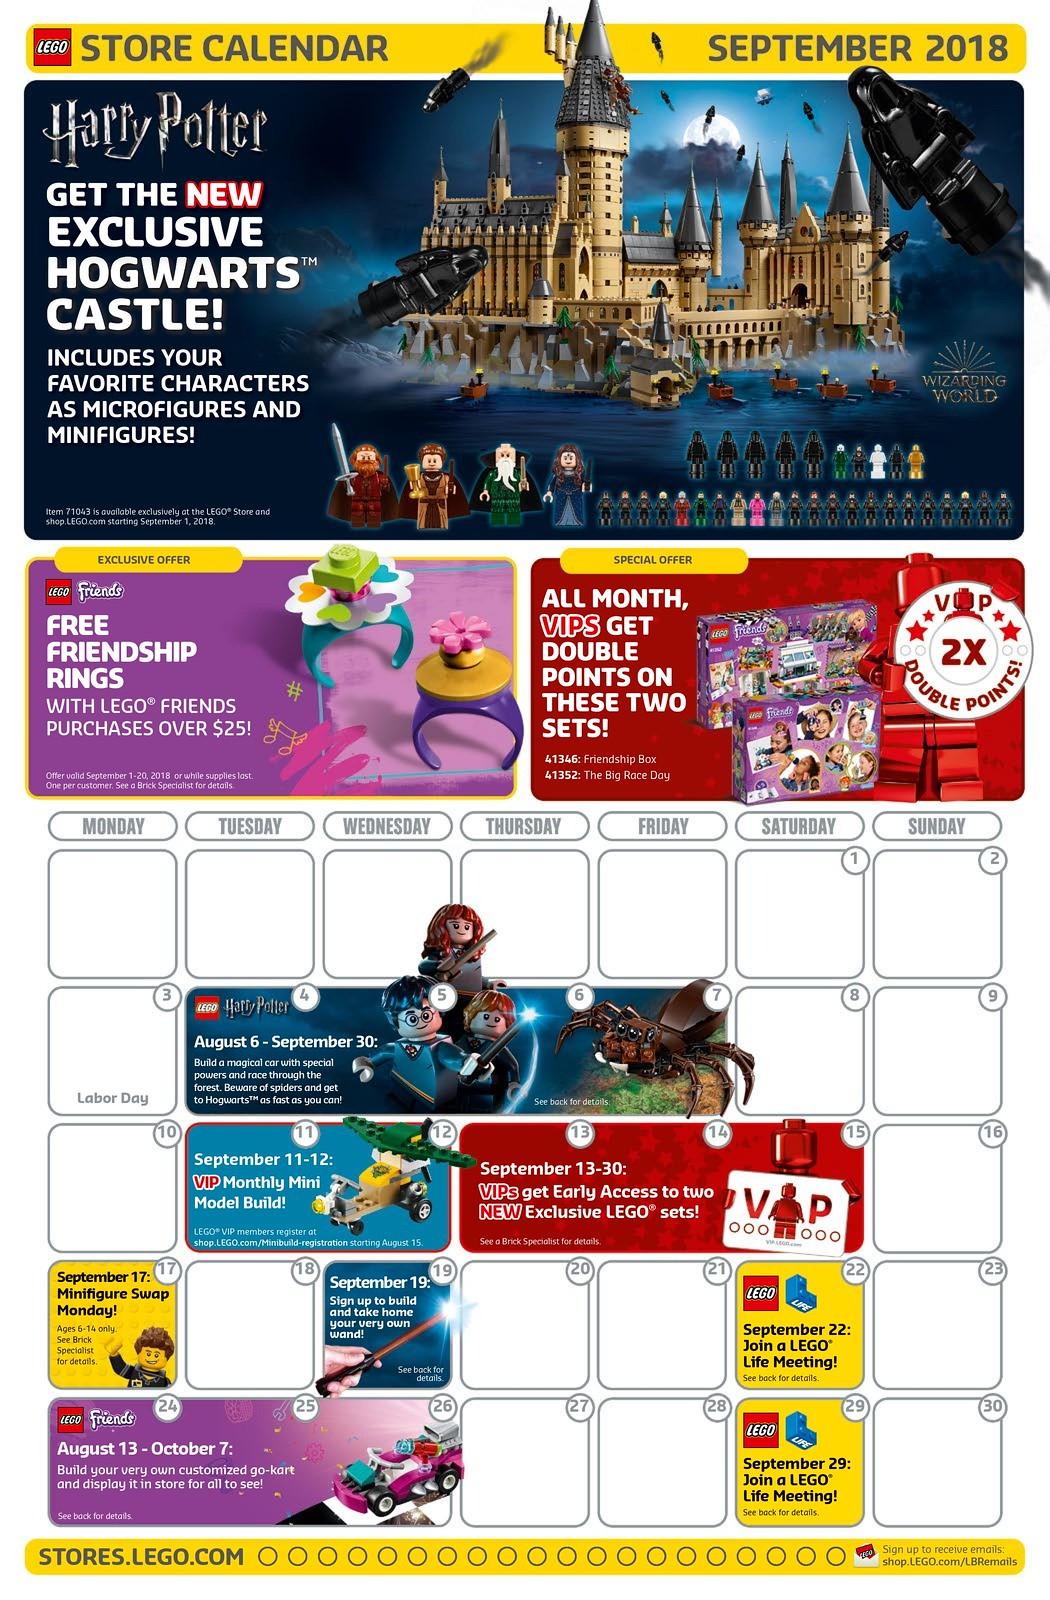 LEGO Brand Store Calendar September 2018